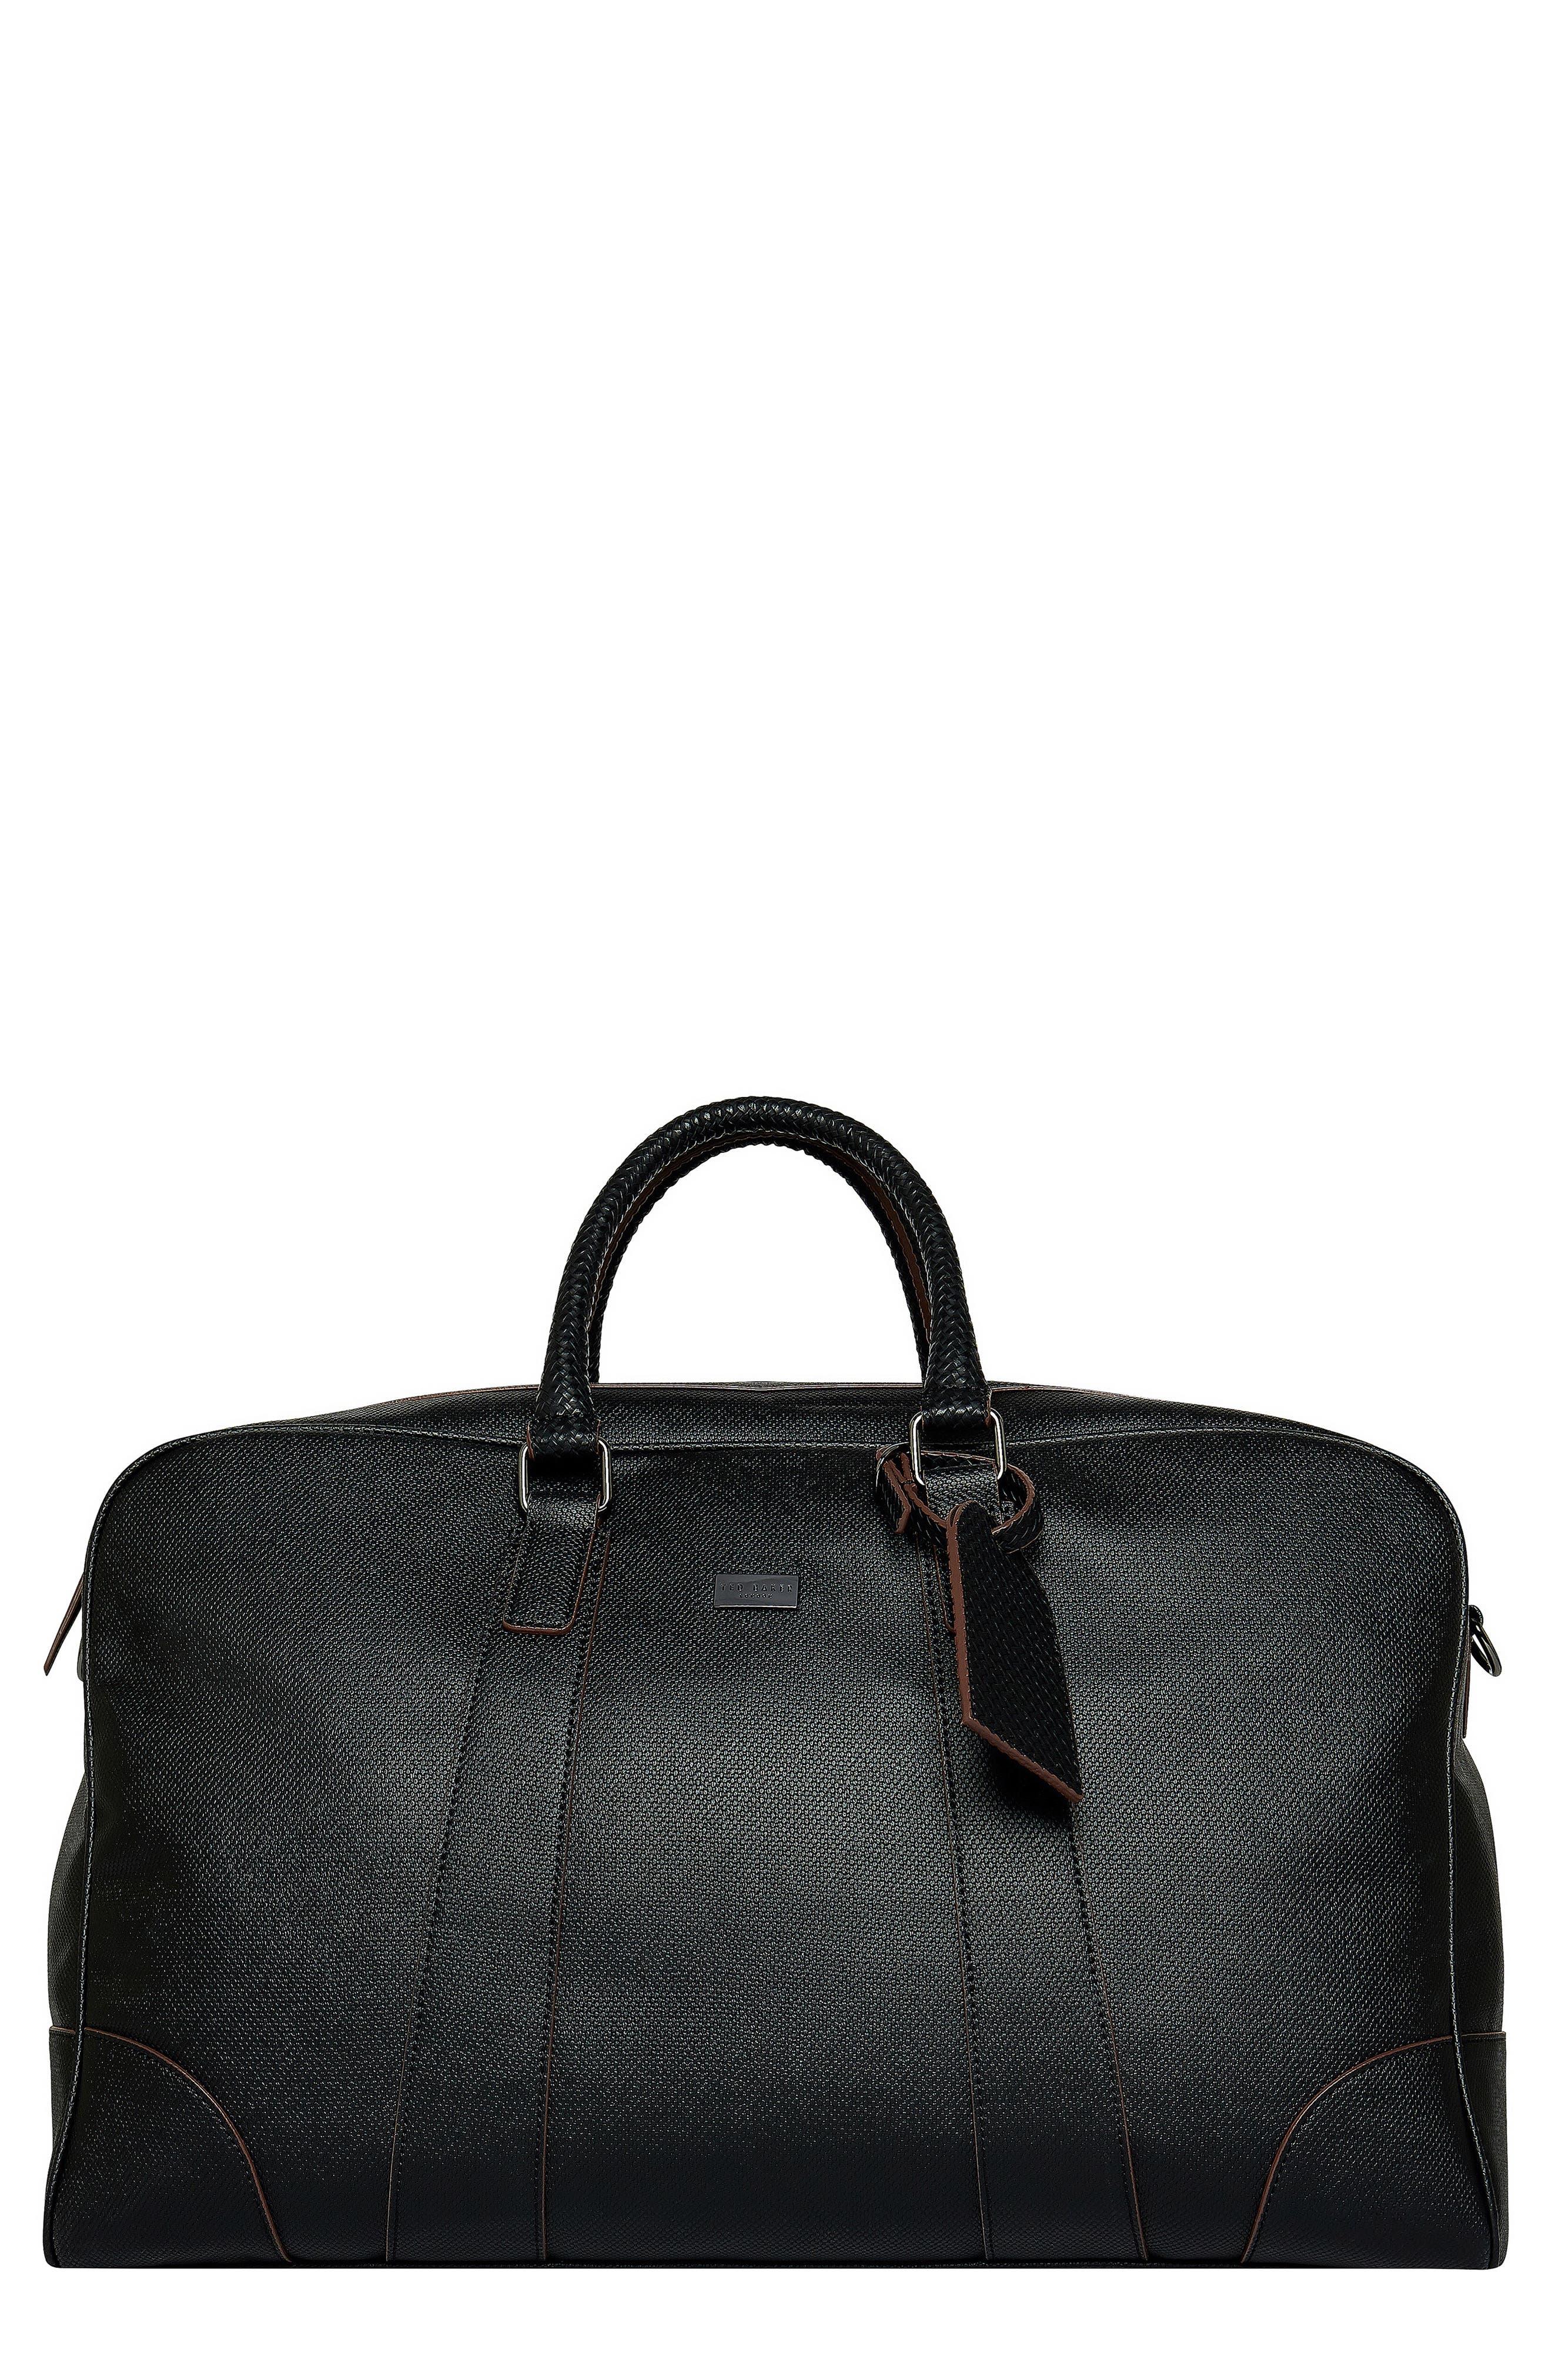 Faux Leather Duffle Bag